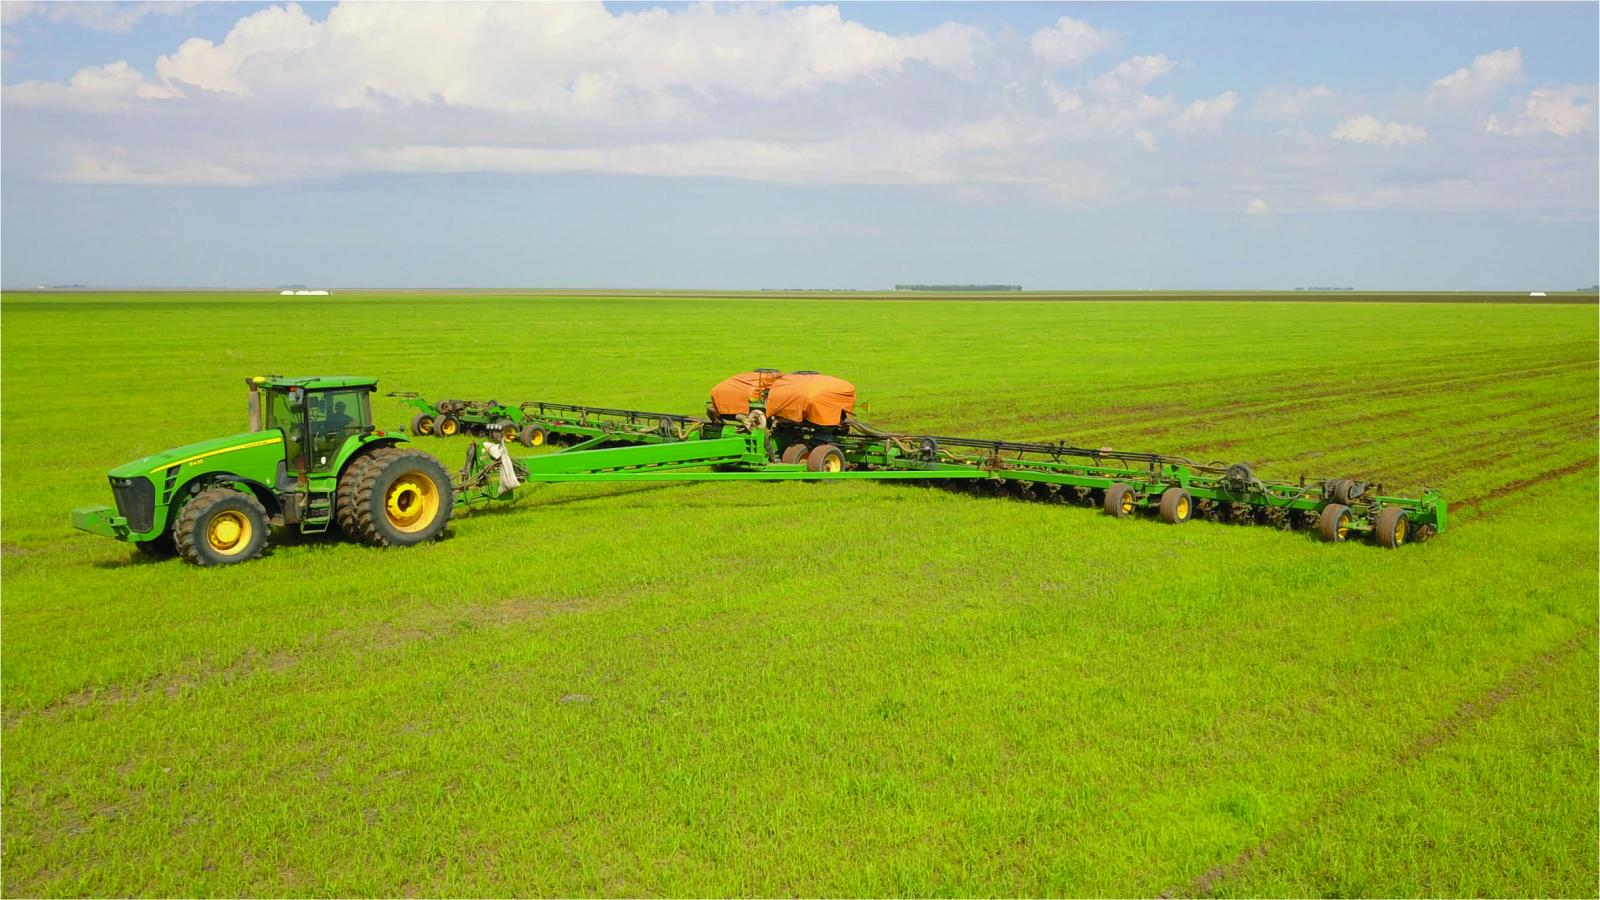 images/2018/04/carroll-farms-farmstead-45-gb1-1523484367mtuymzq4ndm2nw.jpg